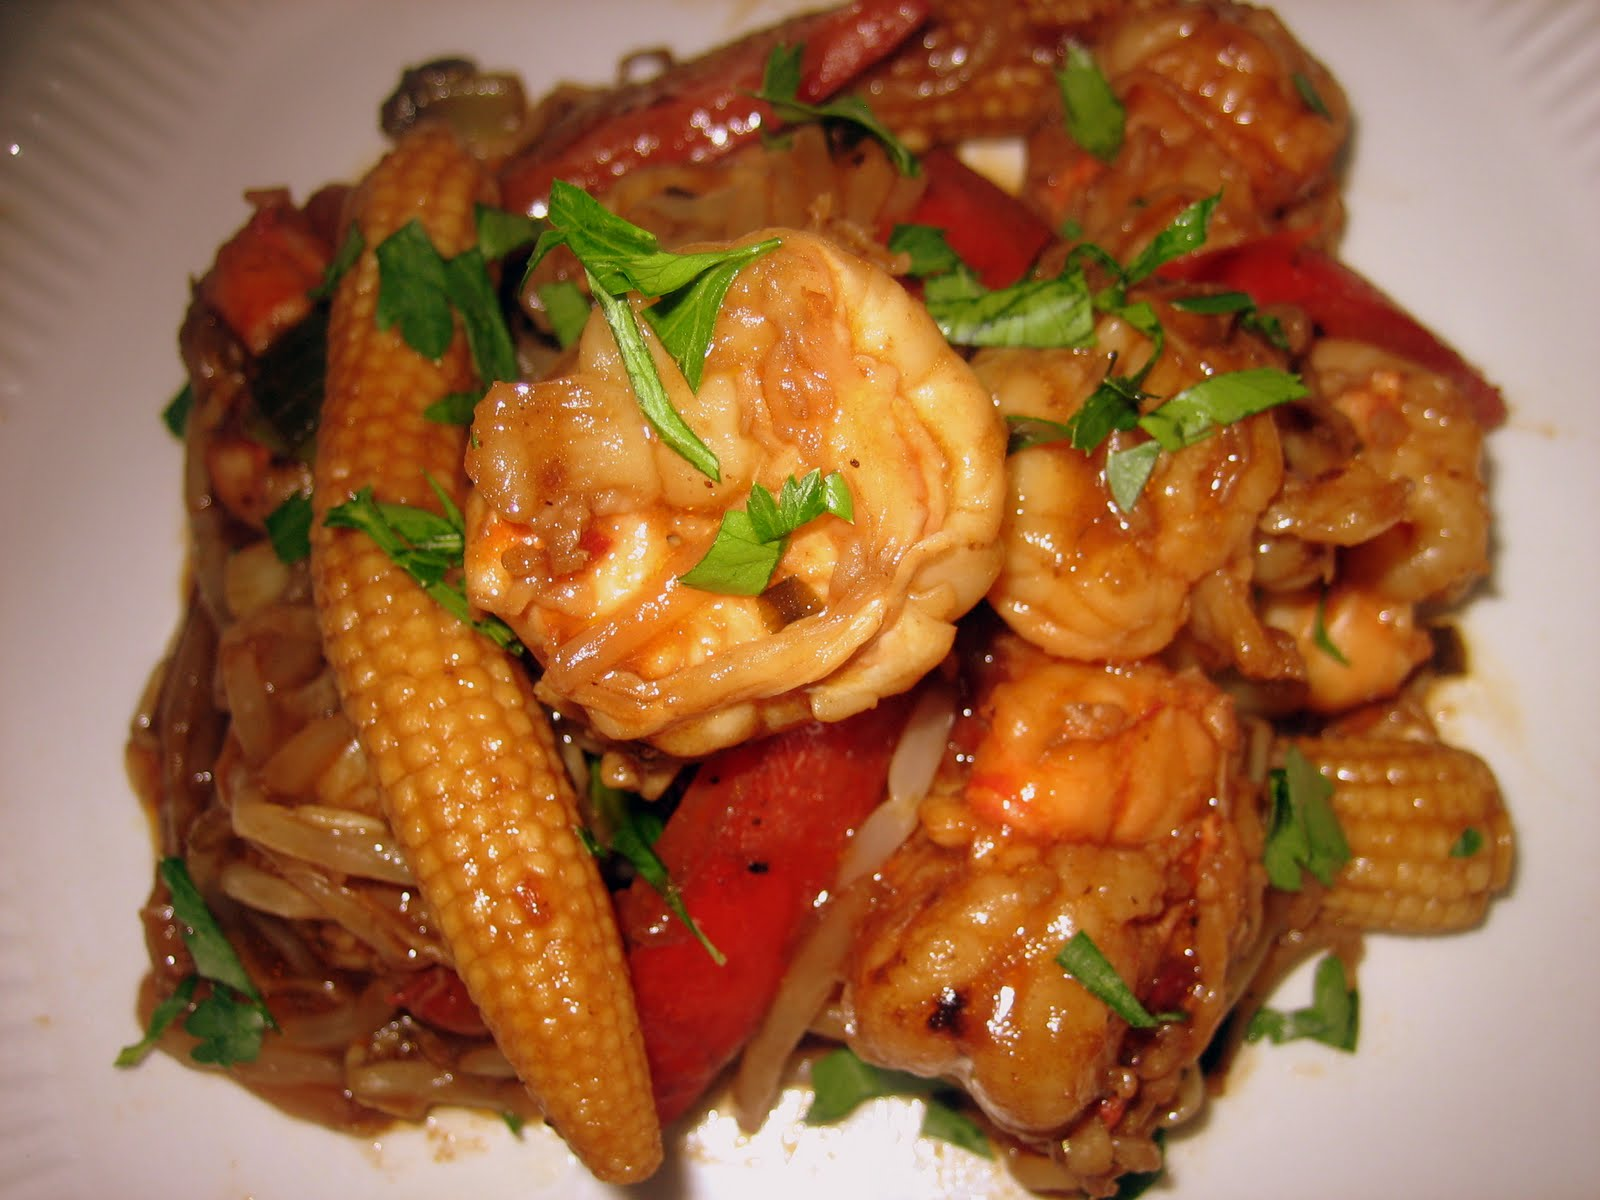 ... : Stir-Fry Spicy Shrimp with Vegetables in Black Bean Garlic Sauce